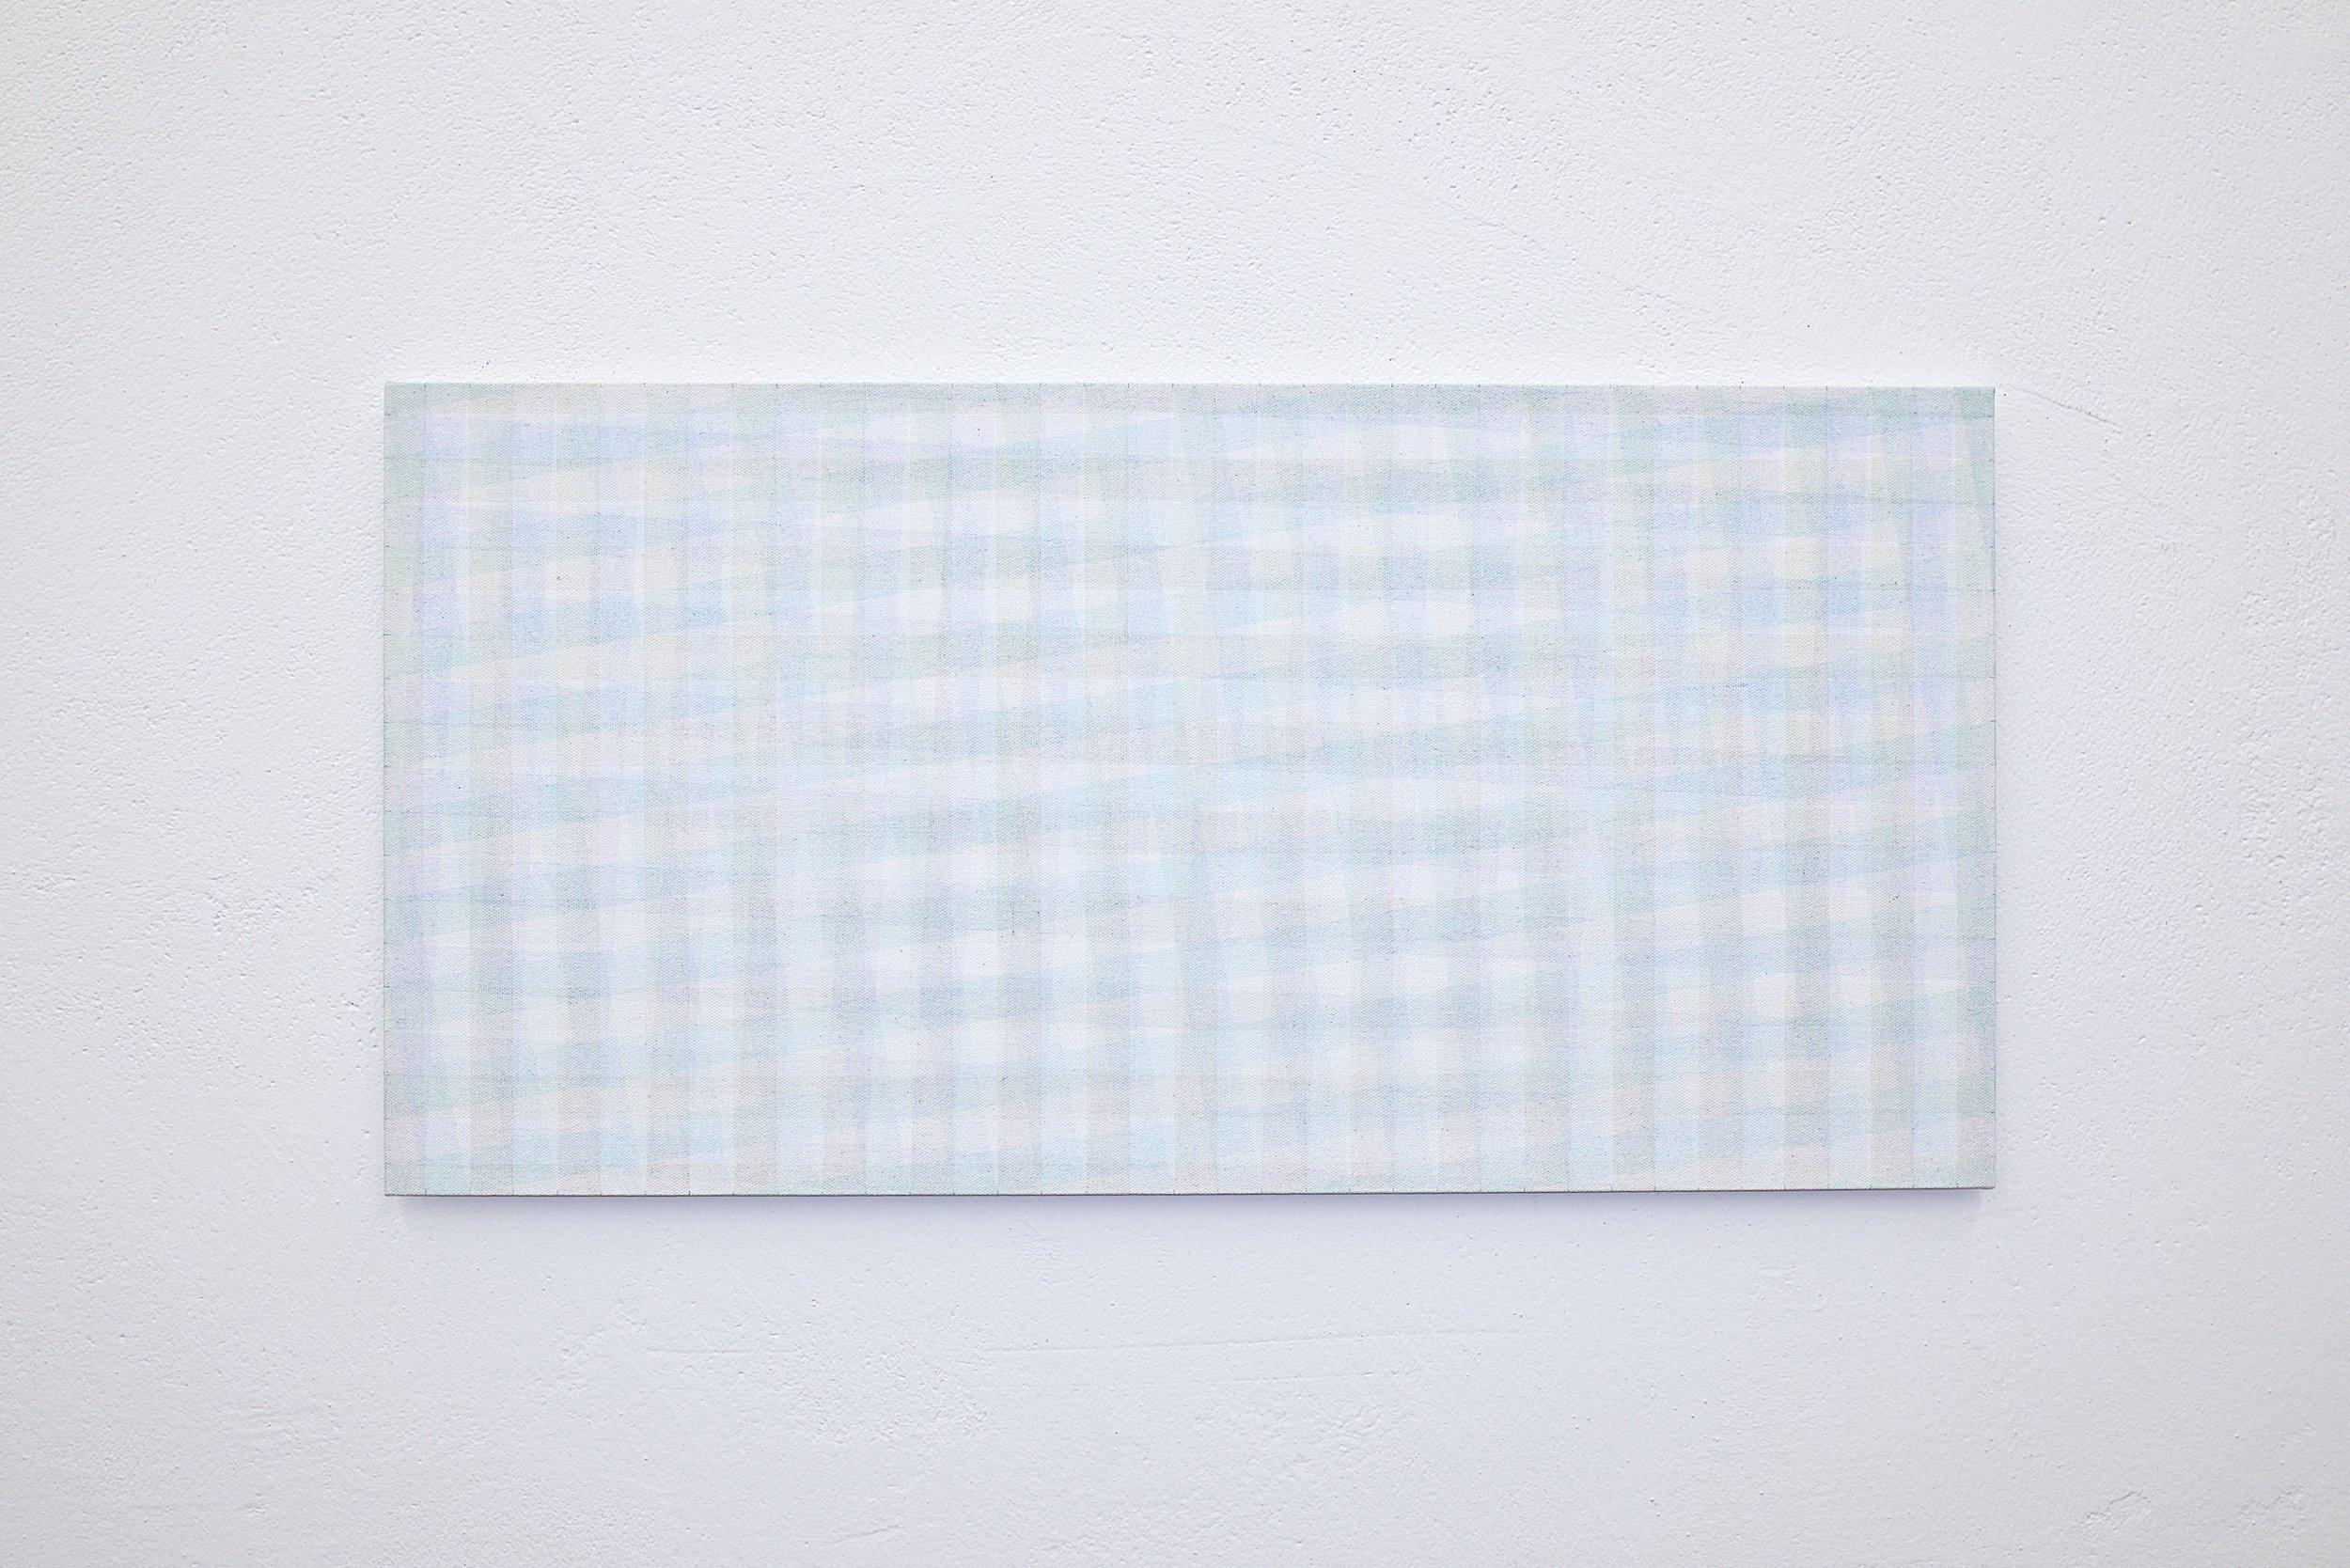 bild nr. 05/2019 - 35 x 70cm - acryl auf baumwolle/alu